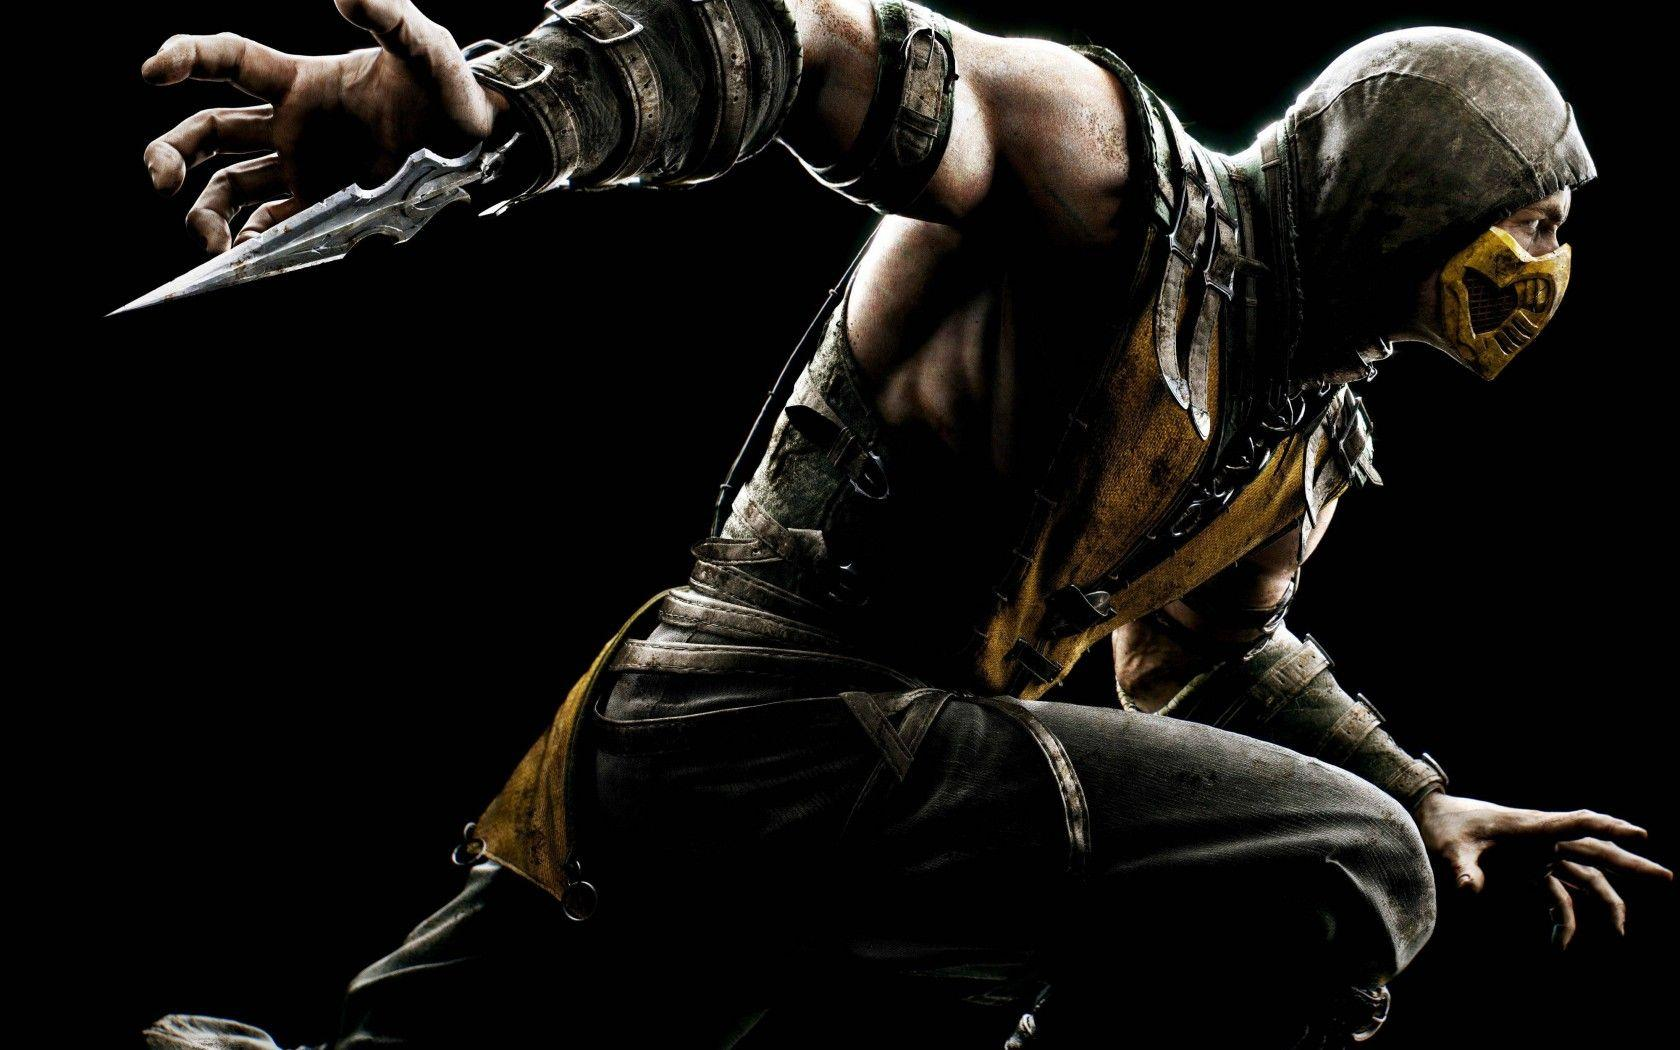 Mortal Kombat 11 Wallpapers - Wallpaper Cave